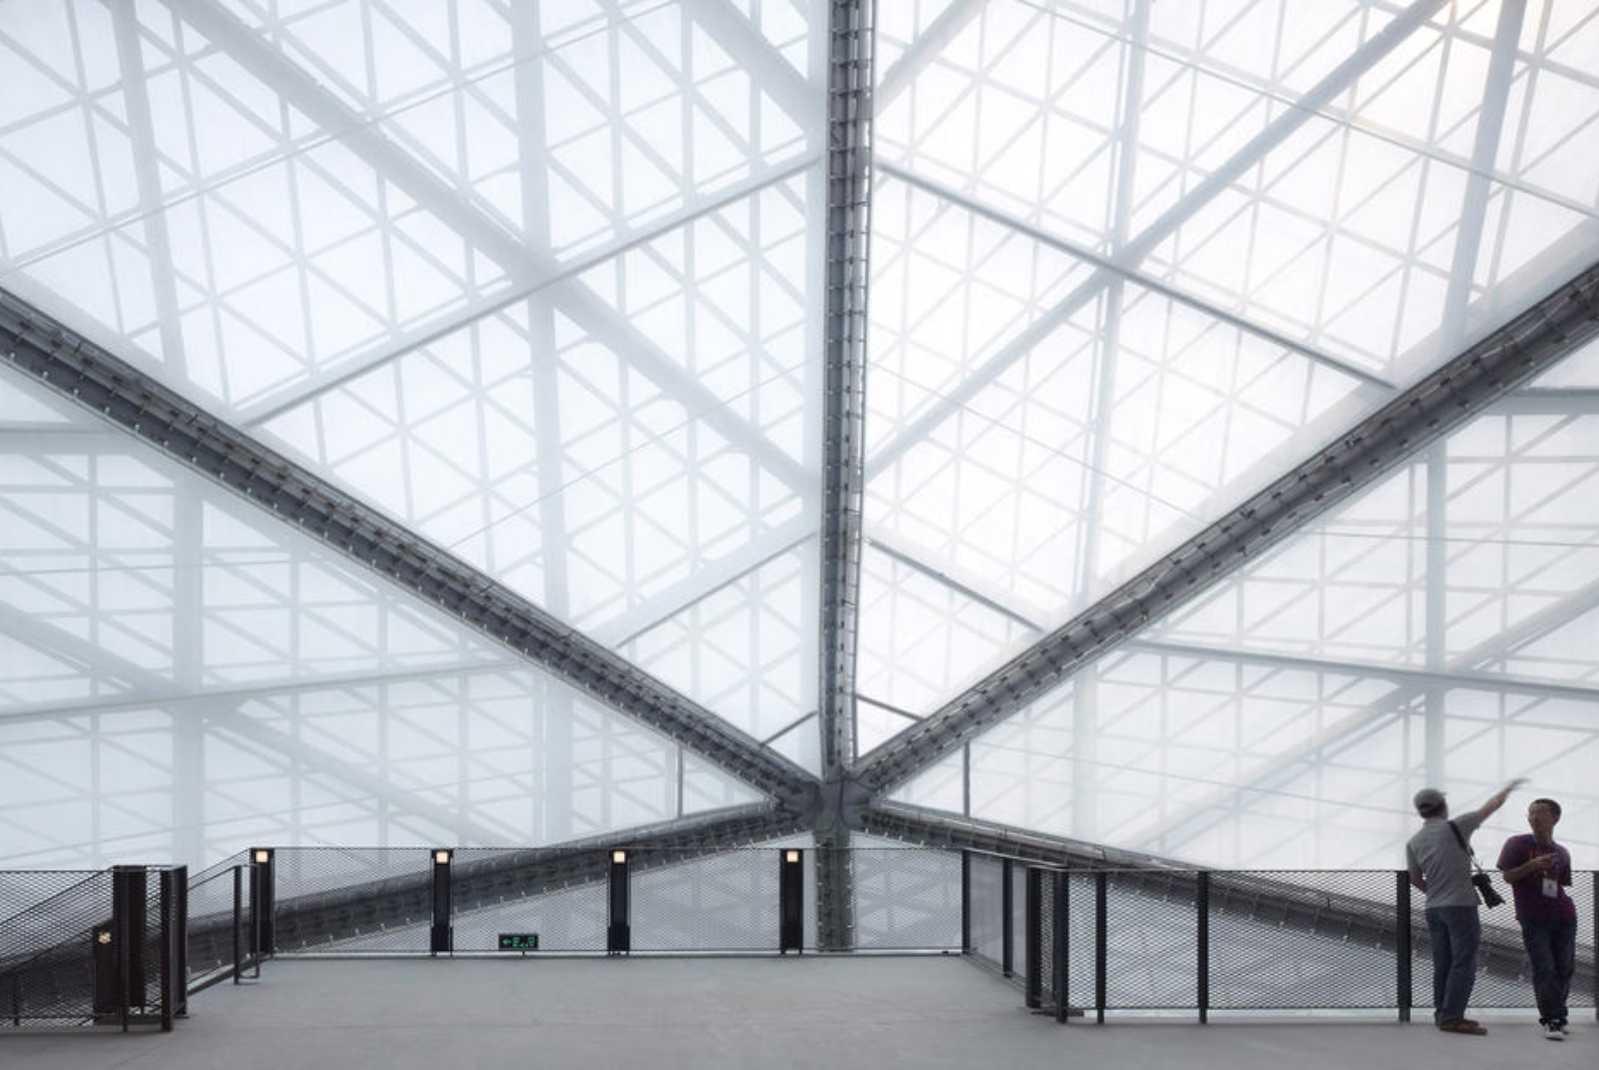 Universiade sports center by gmp architekten a as - Gmp architektur ...